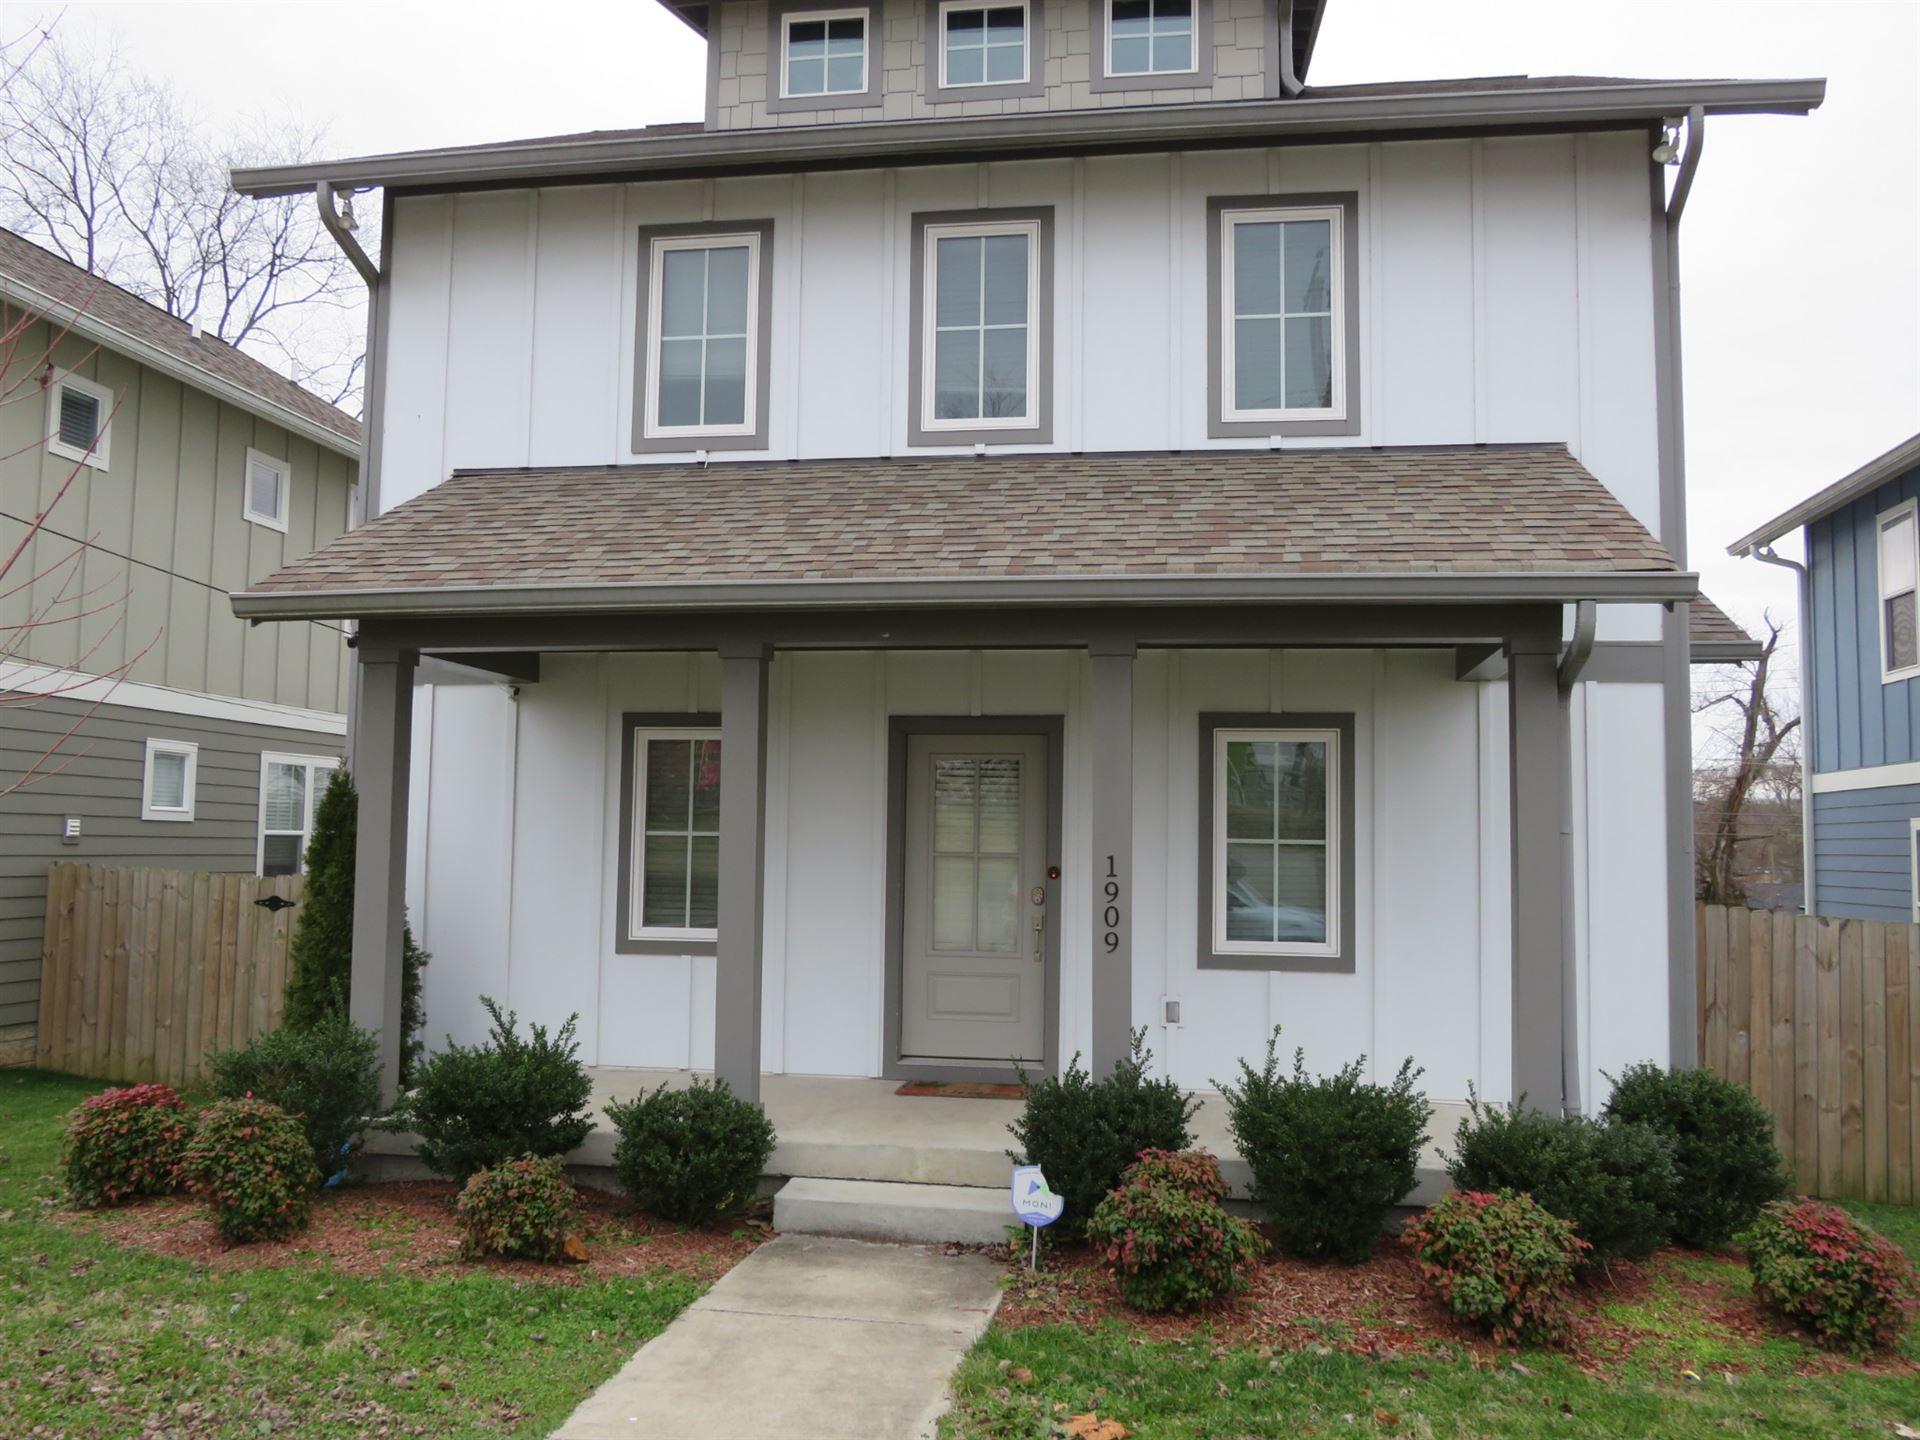 1909 Formosa St, Nashville, TN 37208 - MLS#: 2226520